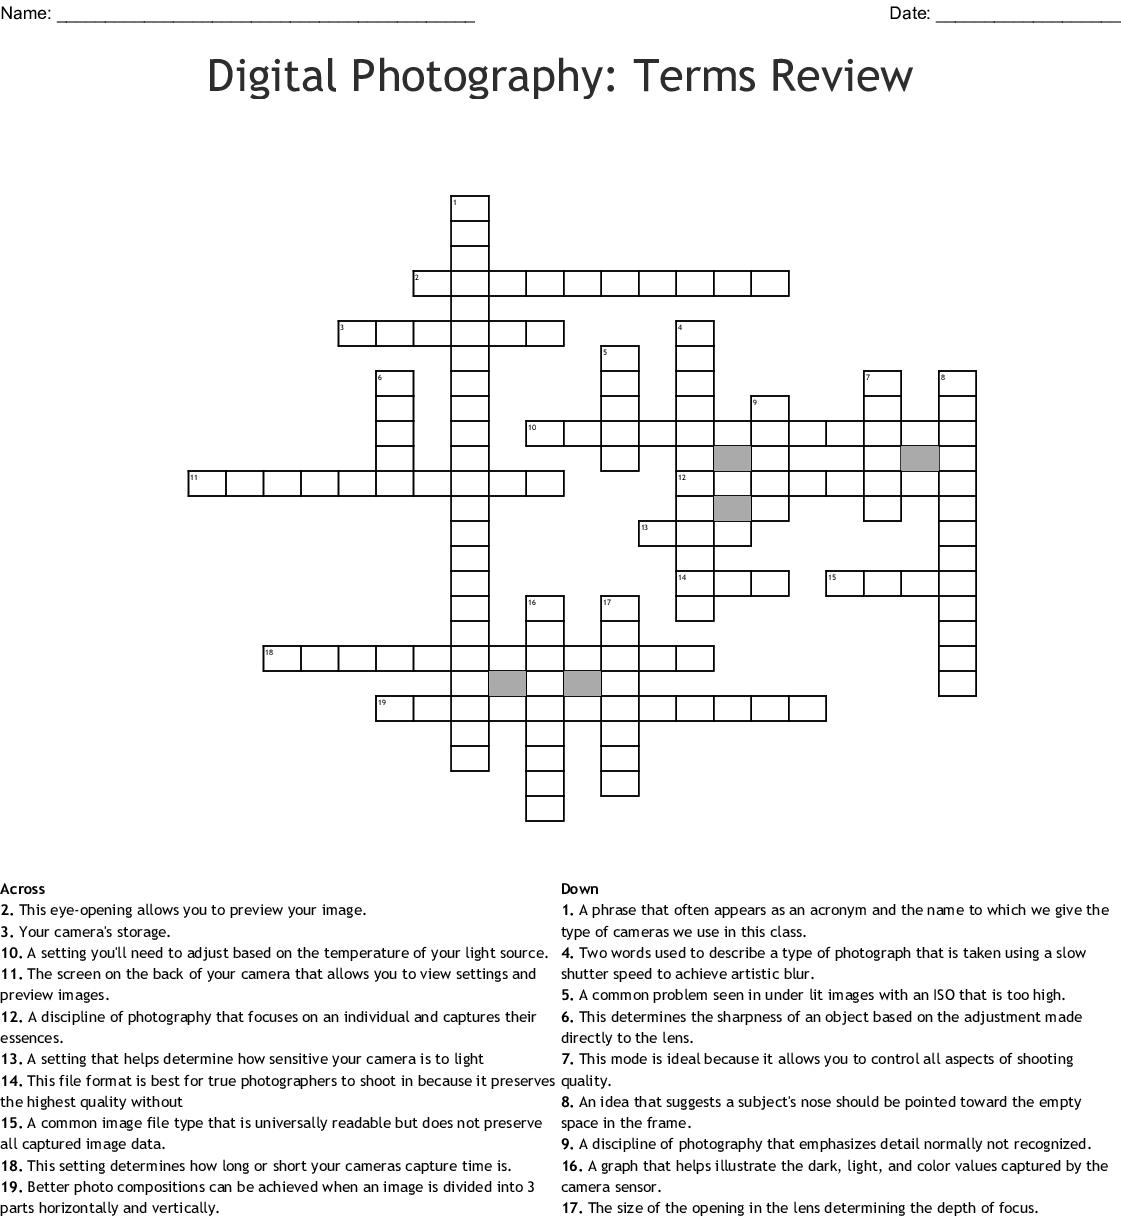 Digital Photography Crossword Puzzle